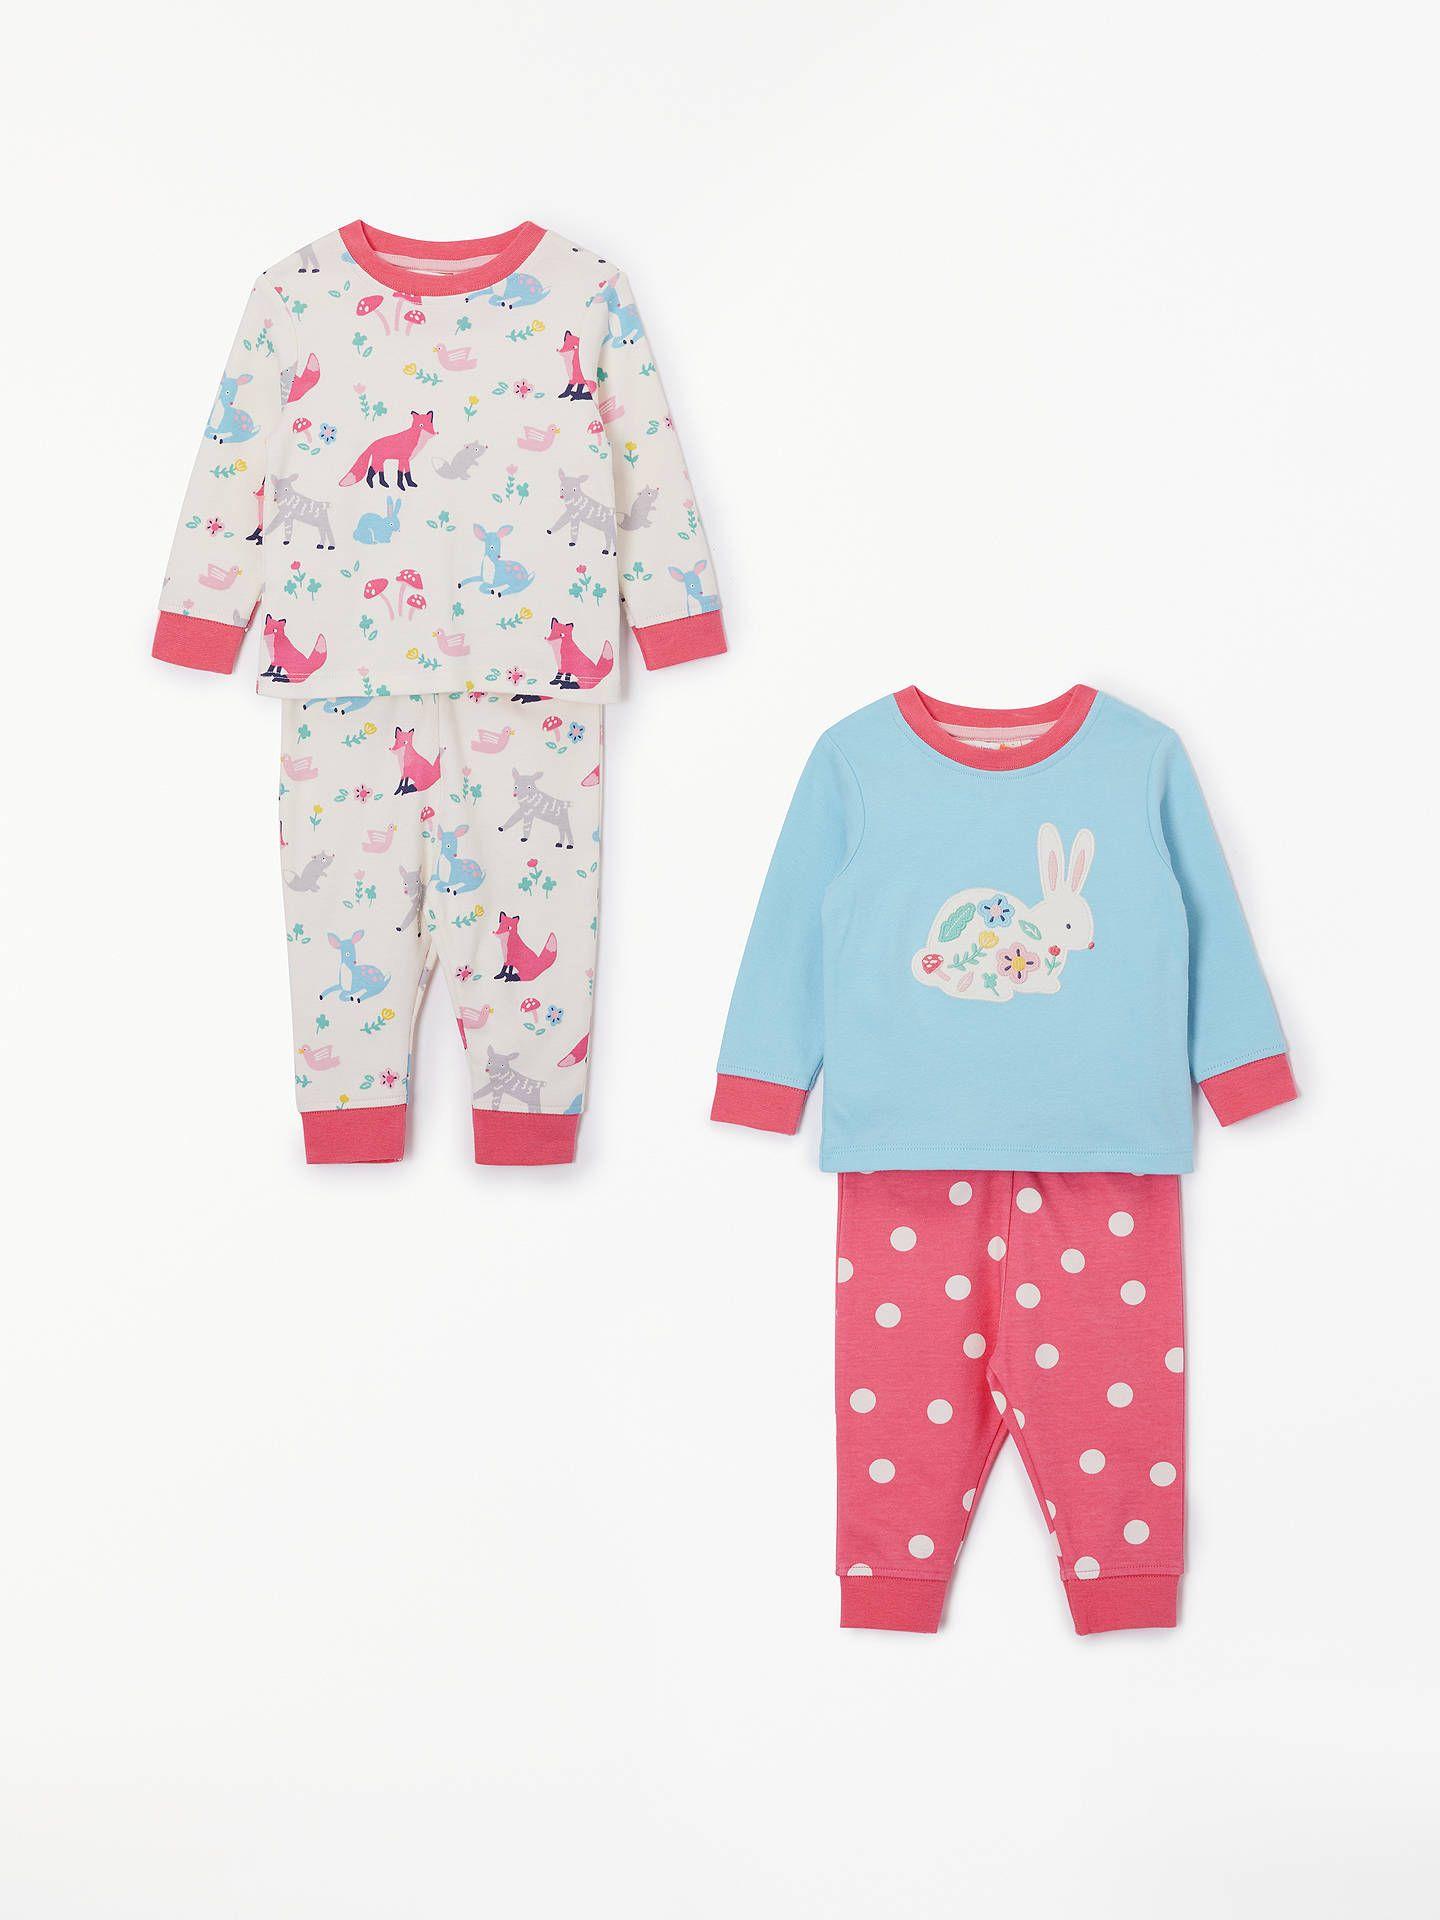 952fffd36f10 John Lewis   Partners Baby GOTS Organic Cotton Woodland Pyjamas ...